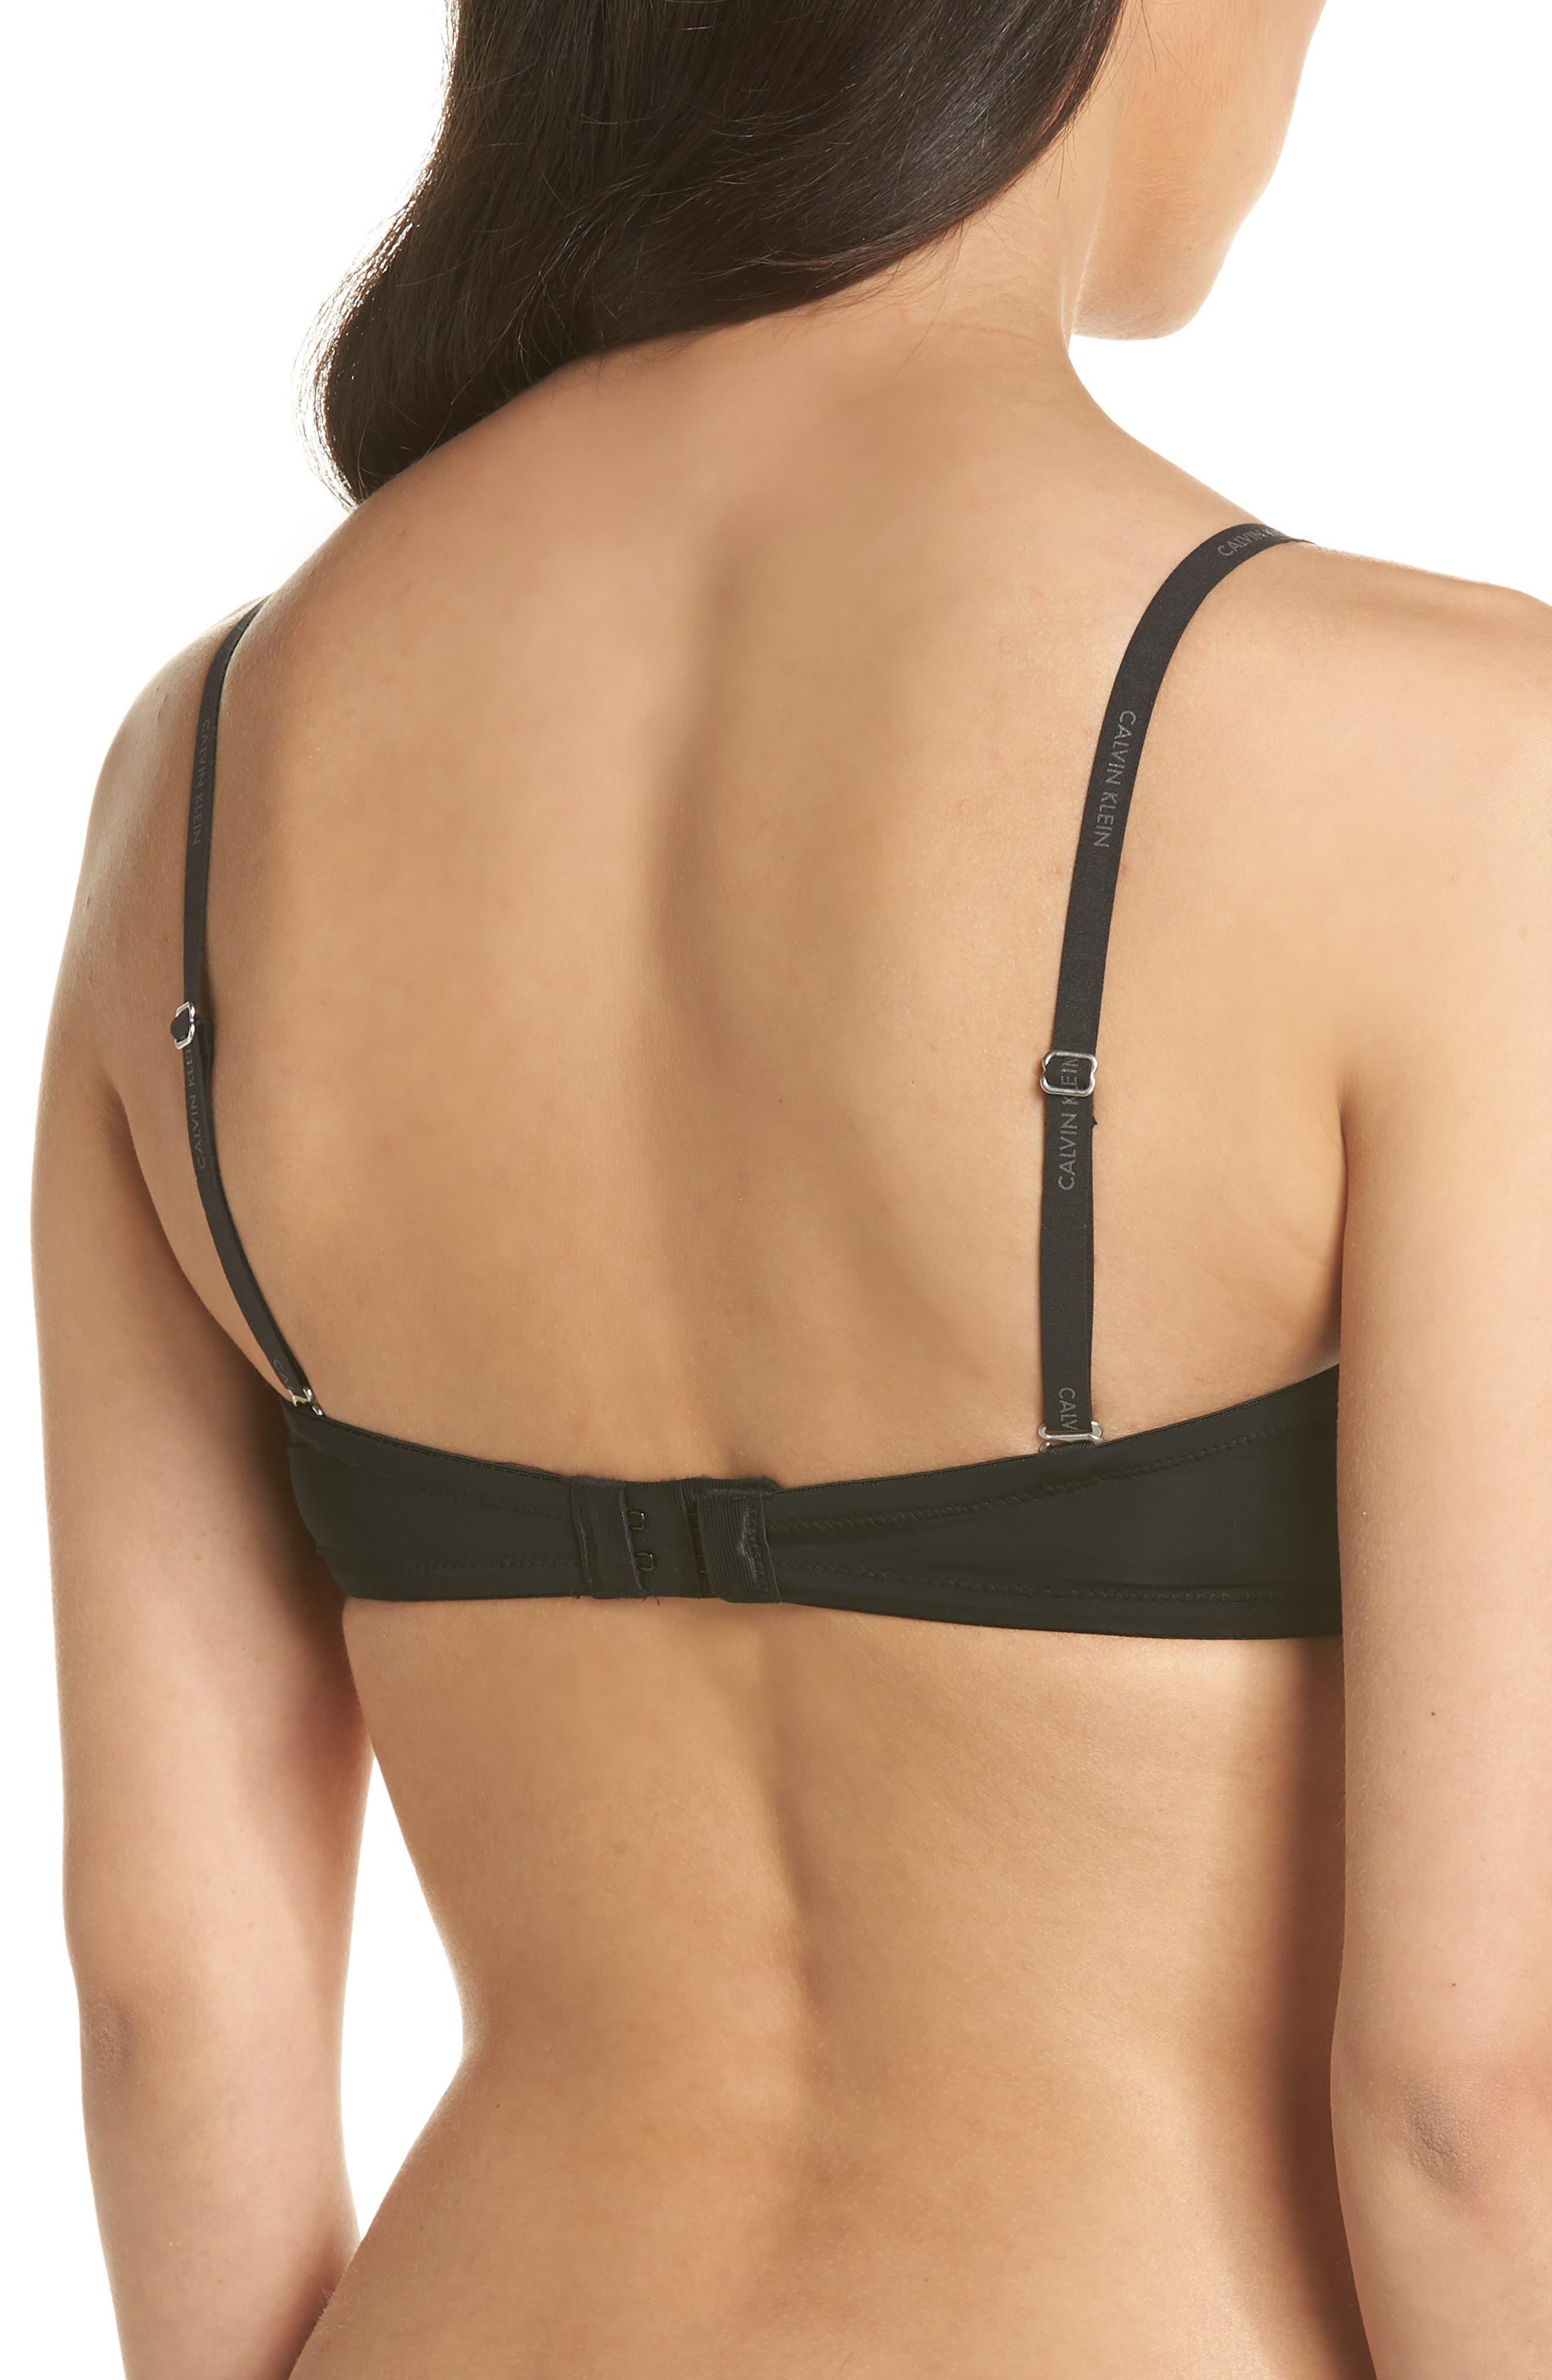 'Naked Glamour' Convertible Strapless Push-Up Bra,                             Alternate thumbnail 4, color,                             BLACK